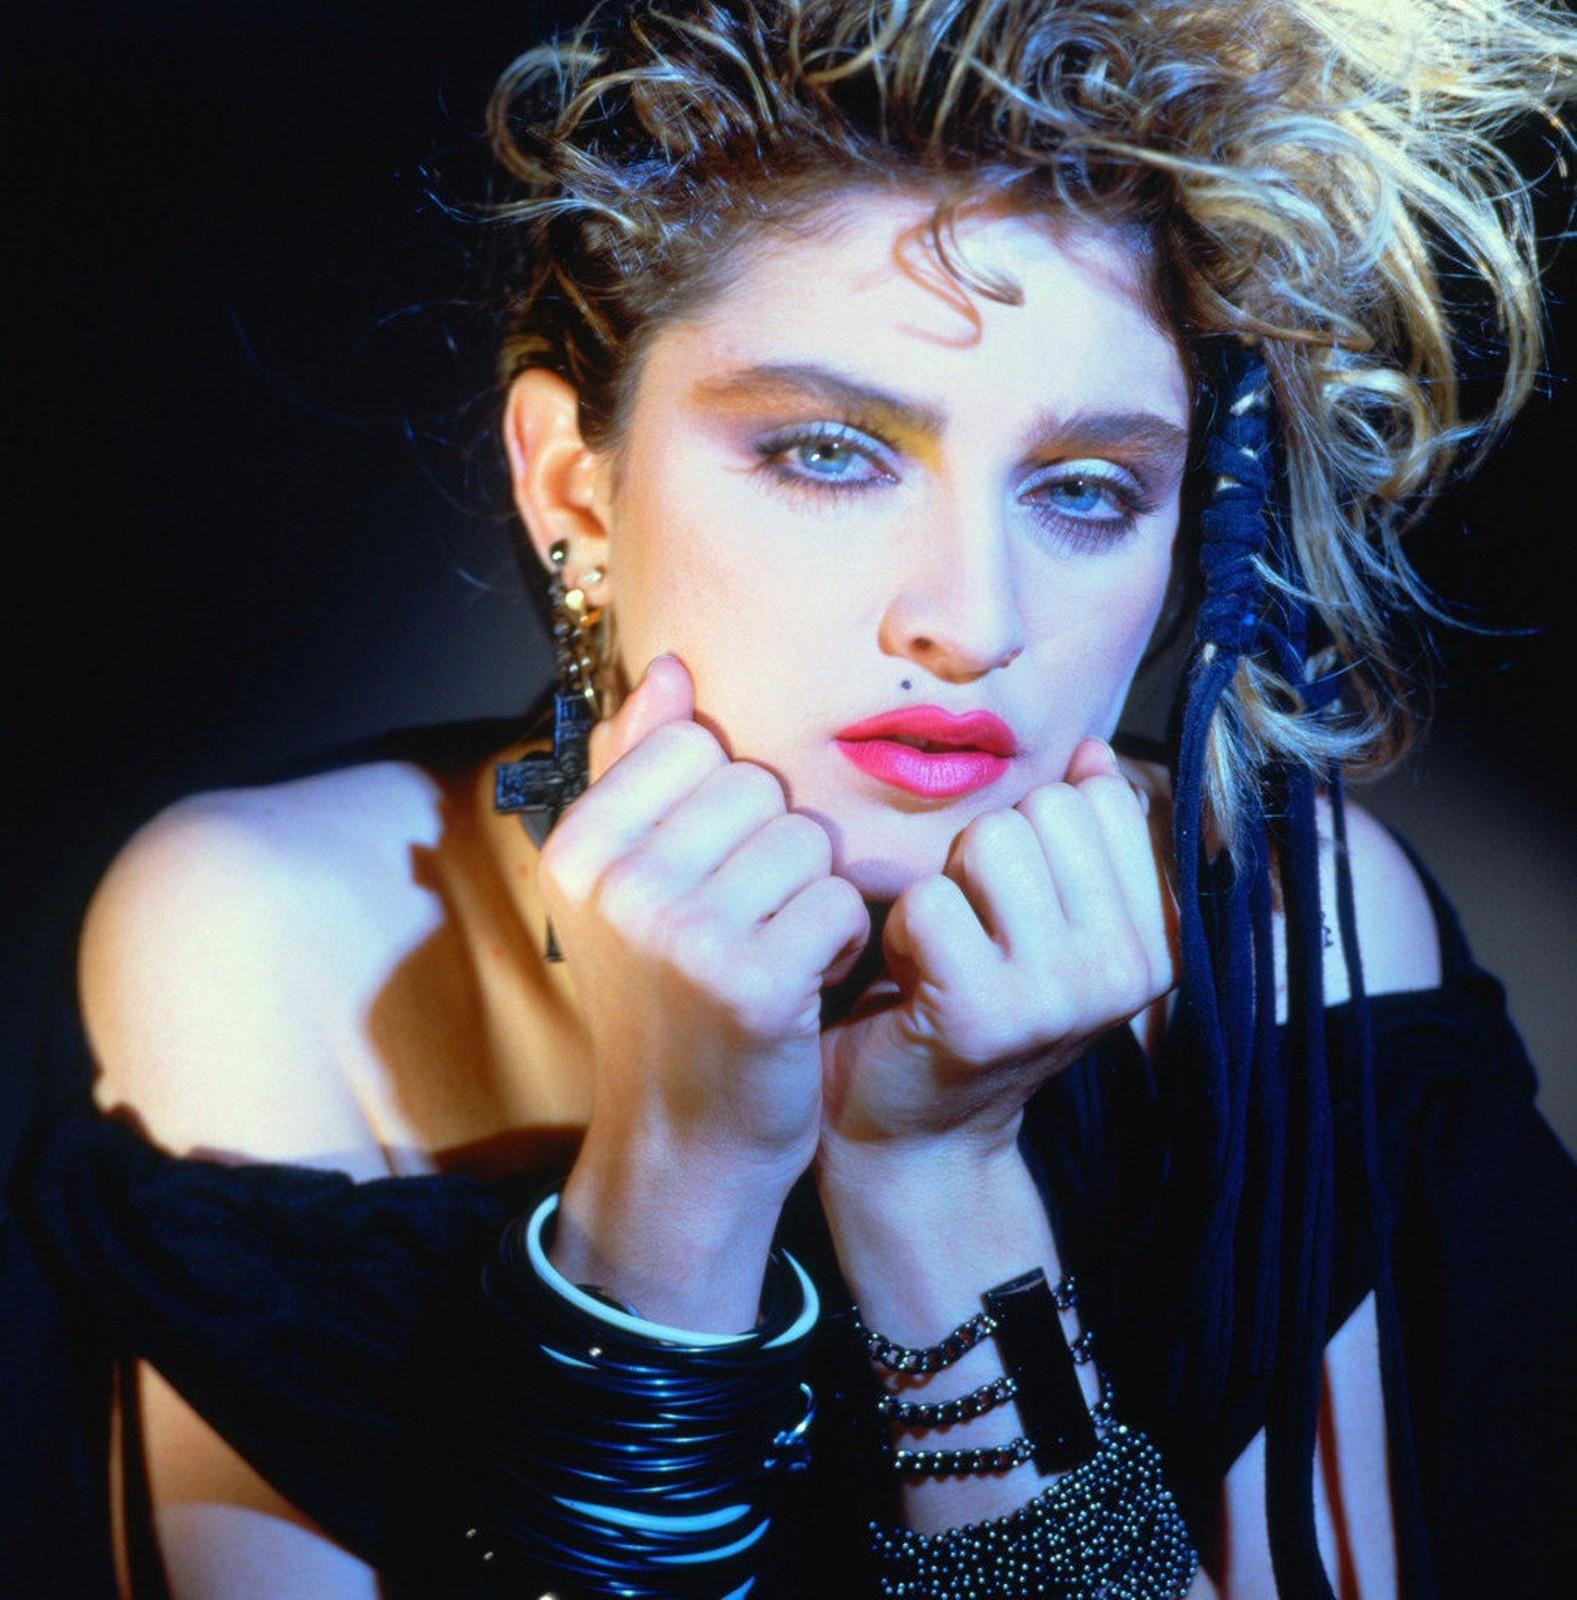 http://1.bp.blogspot.com/-qa5nYRZZB0s/T3I9qLw0hUI/AAAAAAAAgC4/kcjdmoPyn9g/s1600/Madonna.JPG